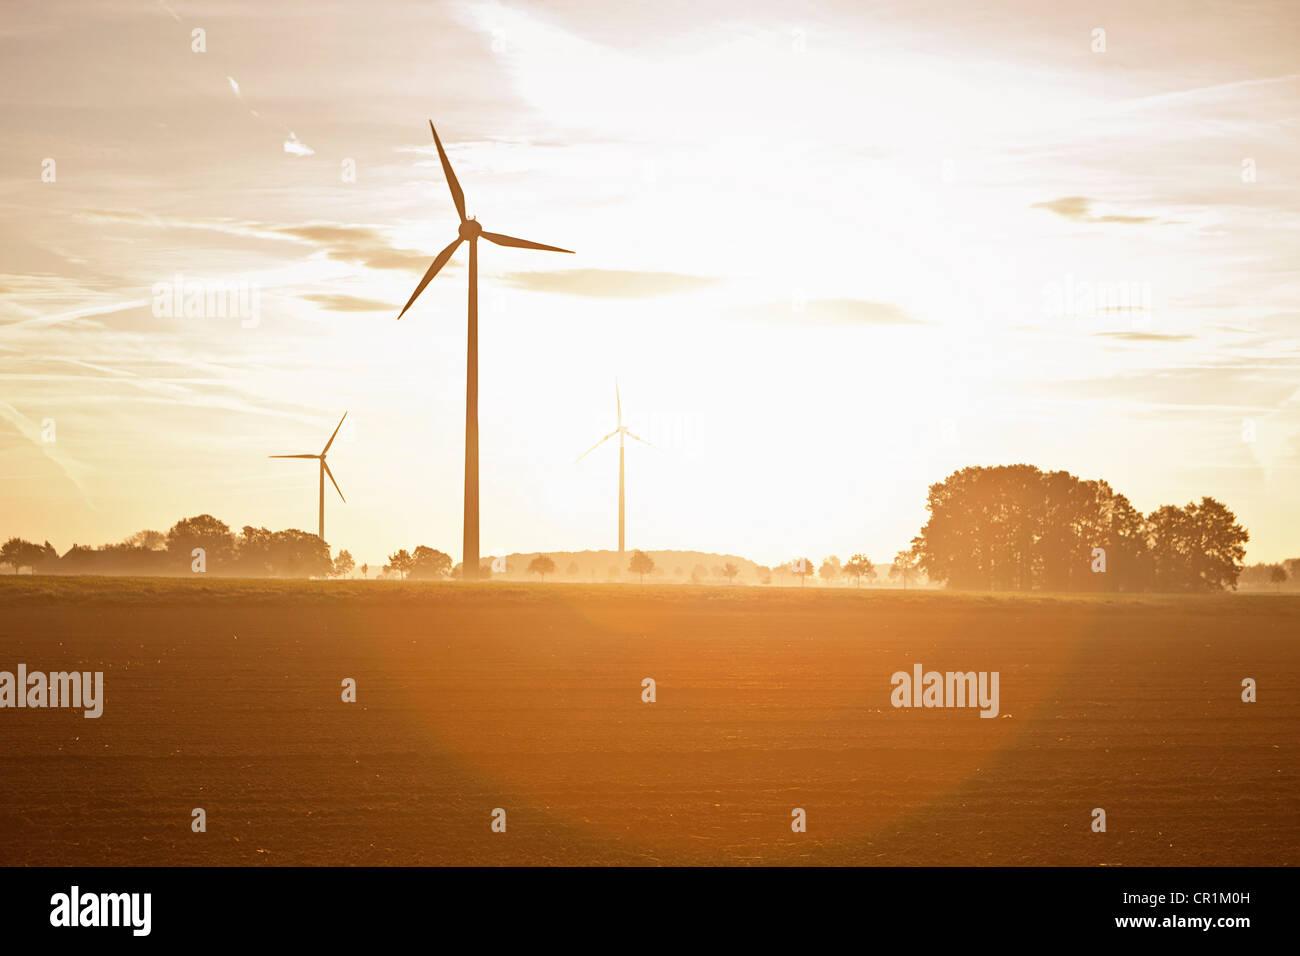 Wind turbines in rural landscape - Stock Image